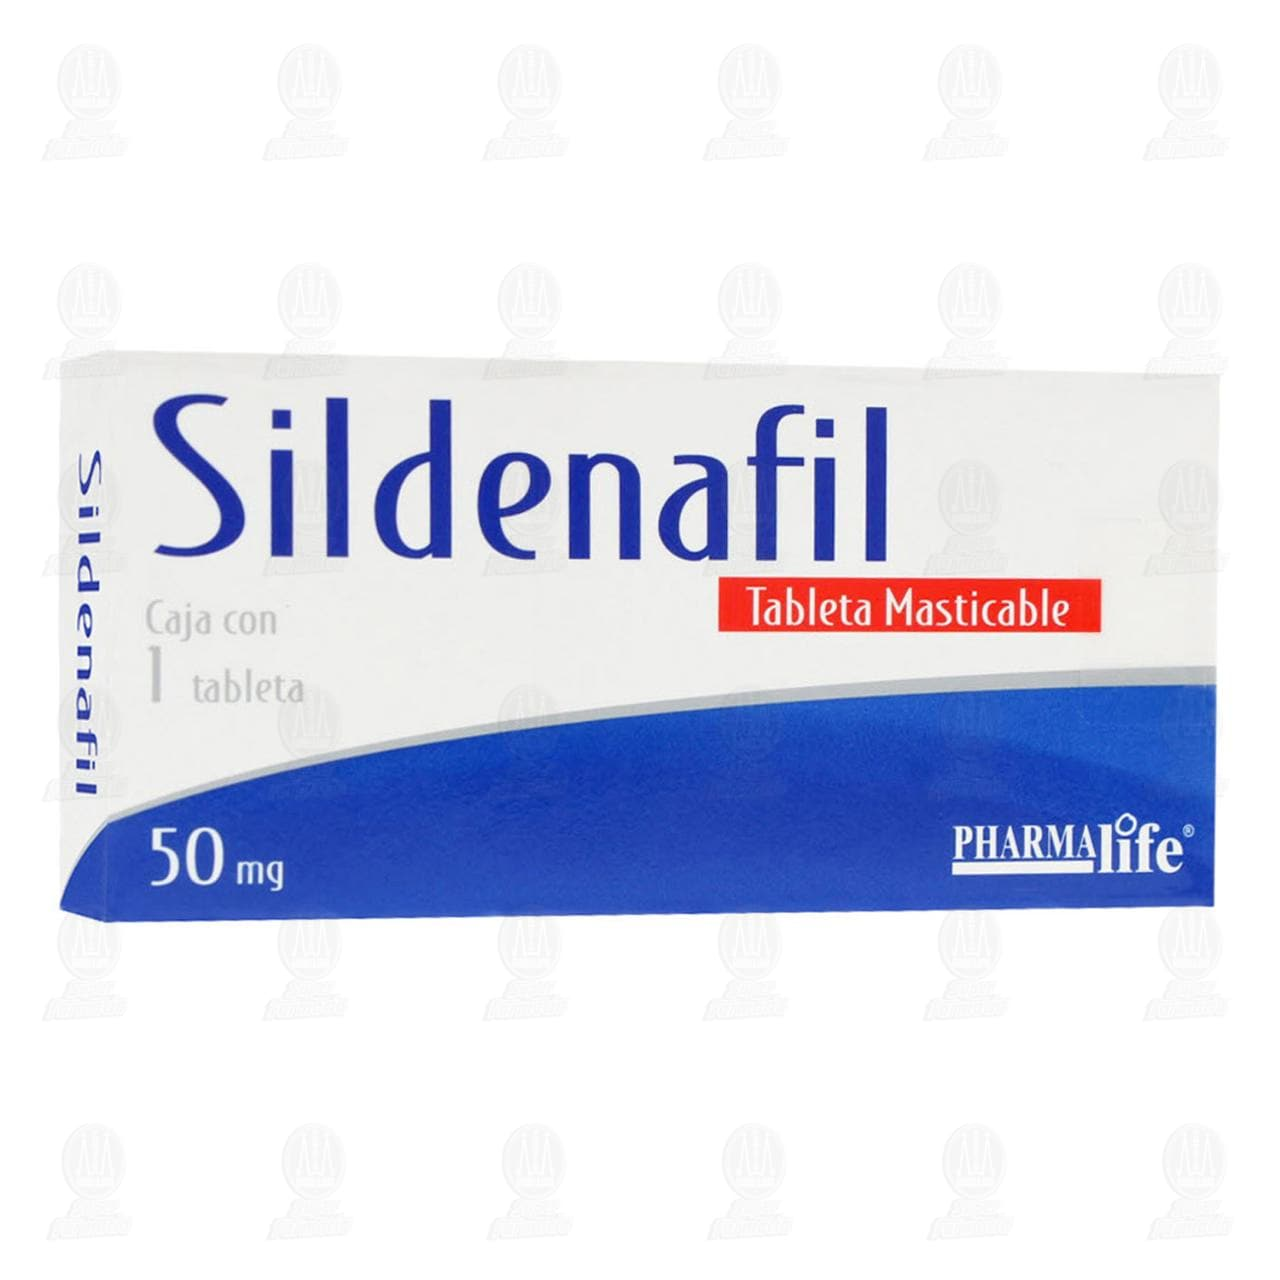 Comprar Sildenafil 50mg 1 Tableta Masticable Pharmalife en Farmacias Guadalajara